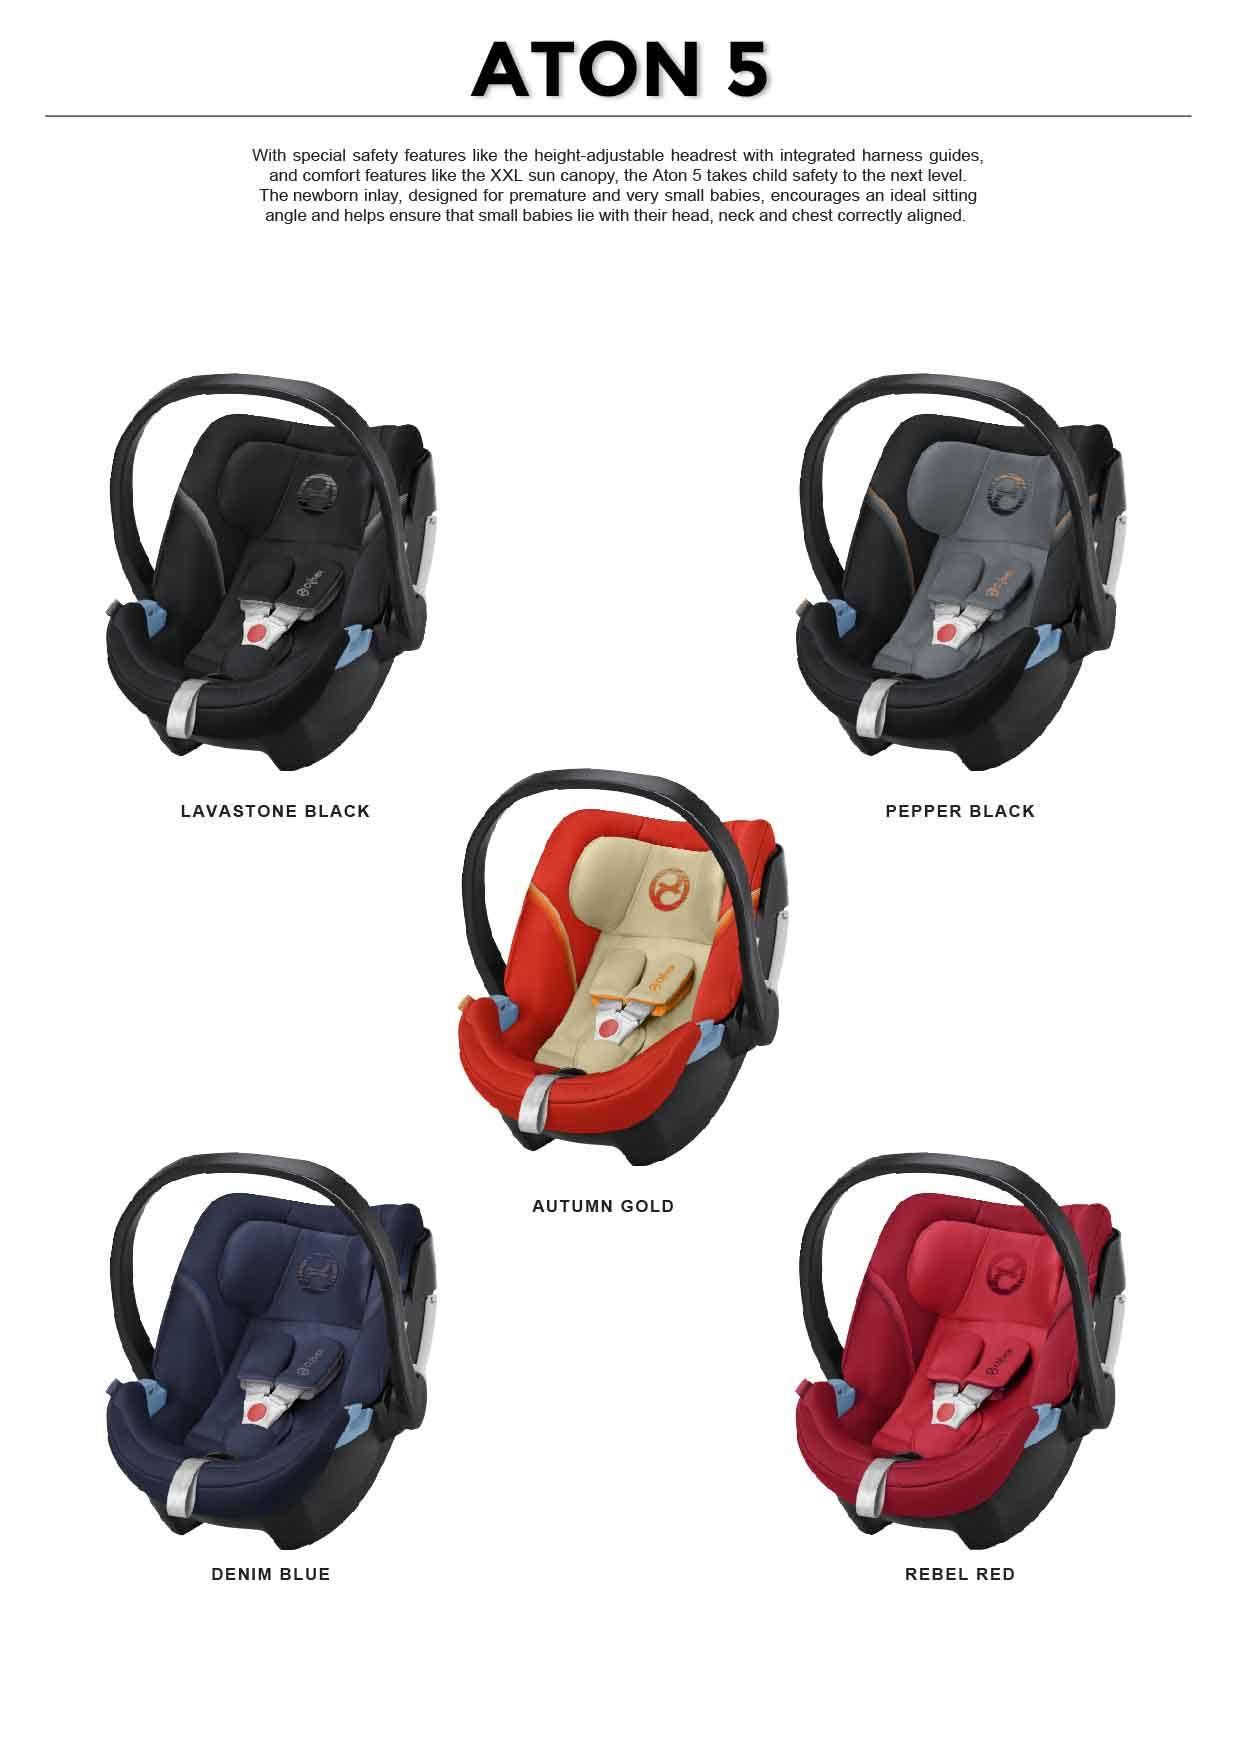 36 Cybex Ideas Cybex Baby Strollers Cybex Gold